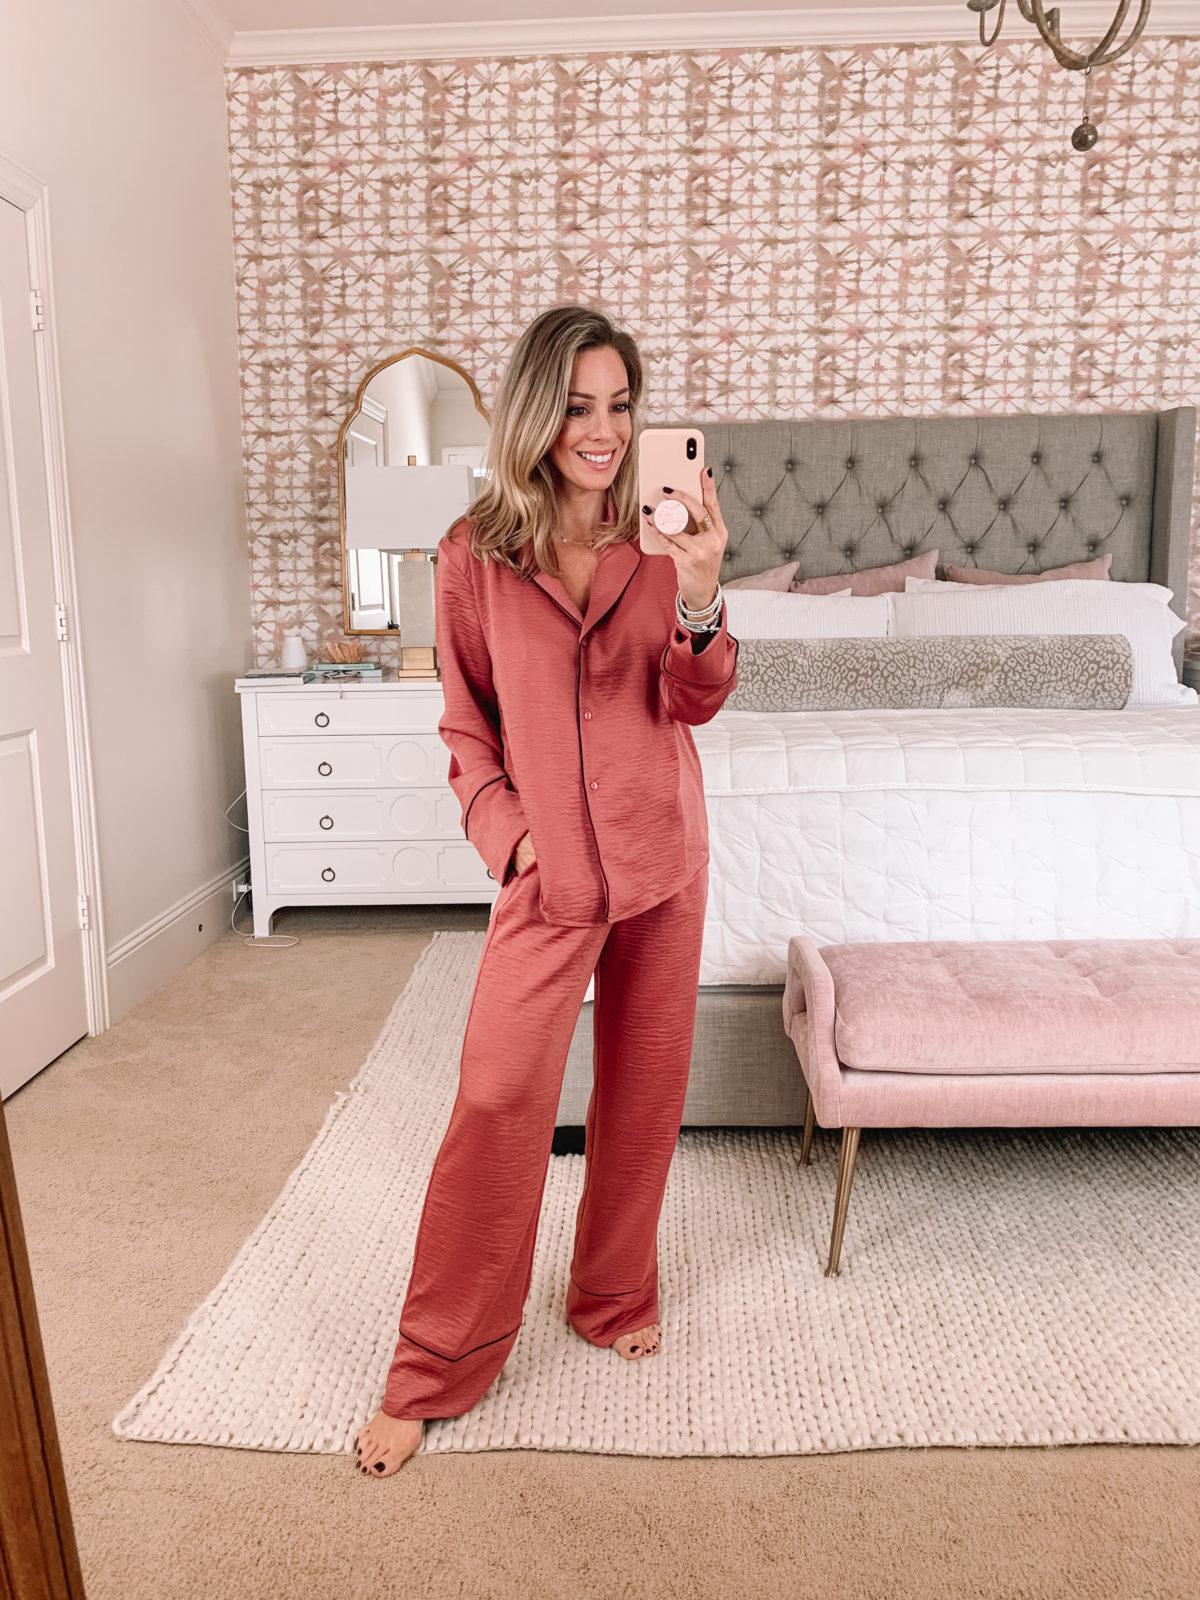 mens style pajama set for women